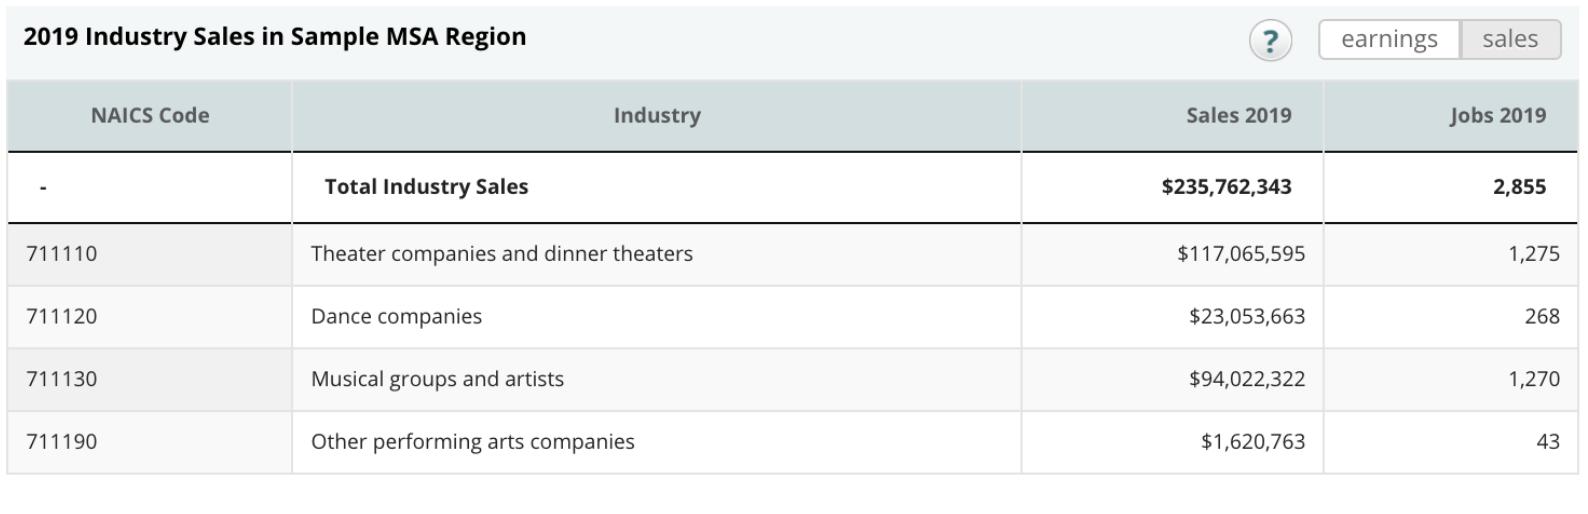 2019 Industry Sales in Sample MSA Region